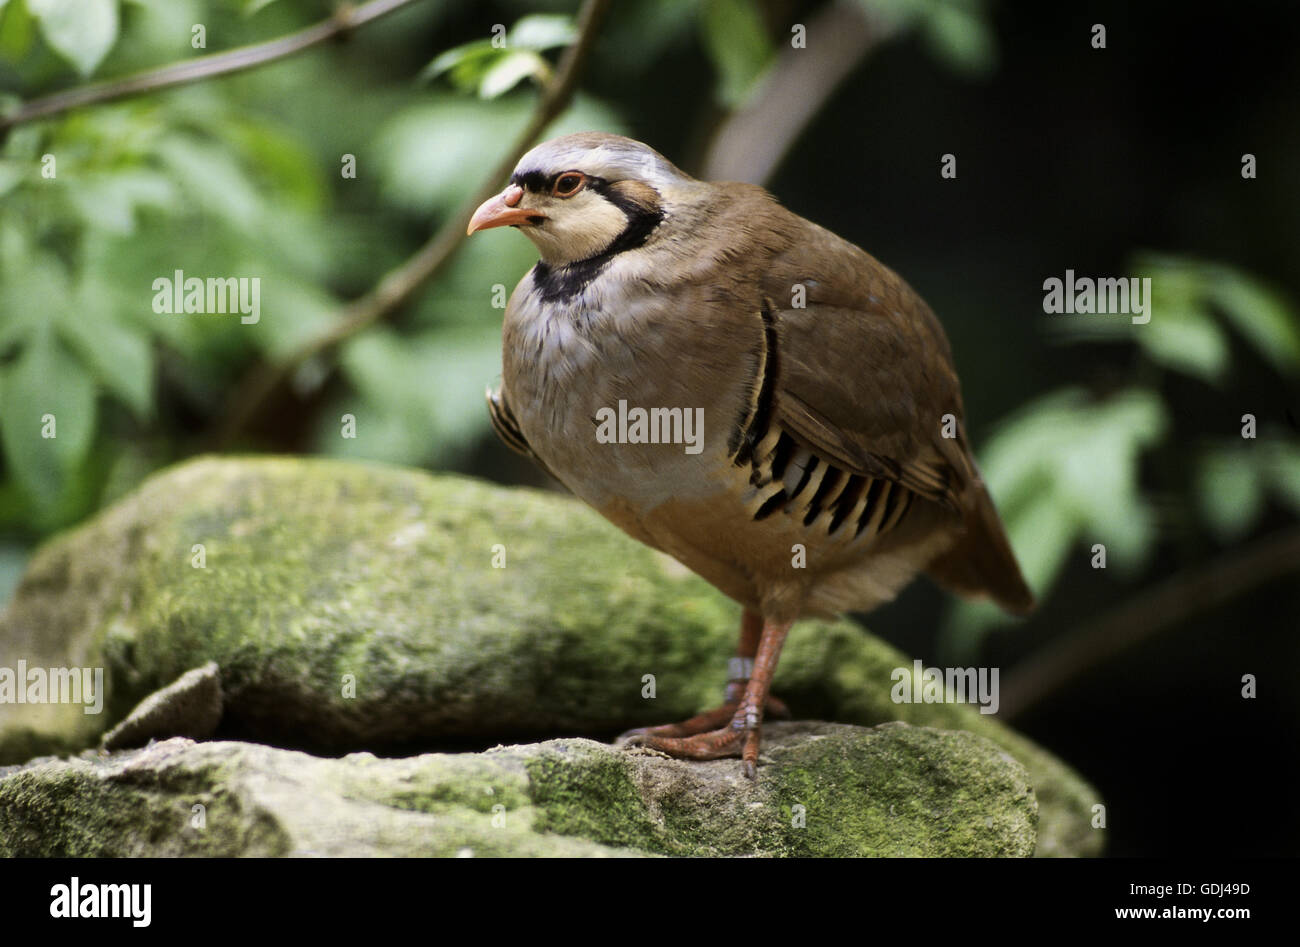 zoology / animals, avian / birds, Rock Partridge, (Alectoris graeca), standing on rock, distribution: Europe, - Stock Image